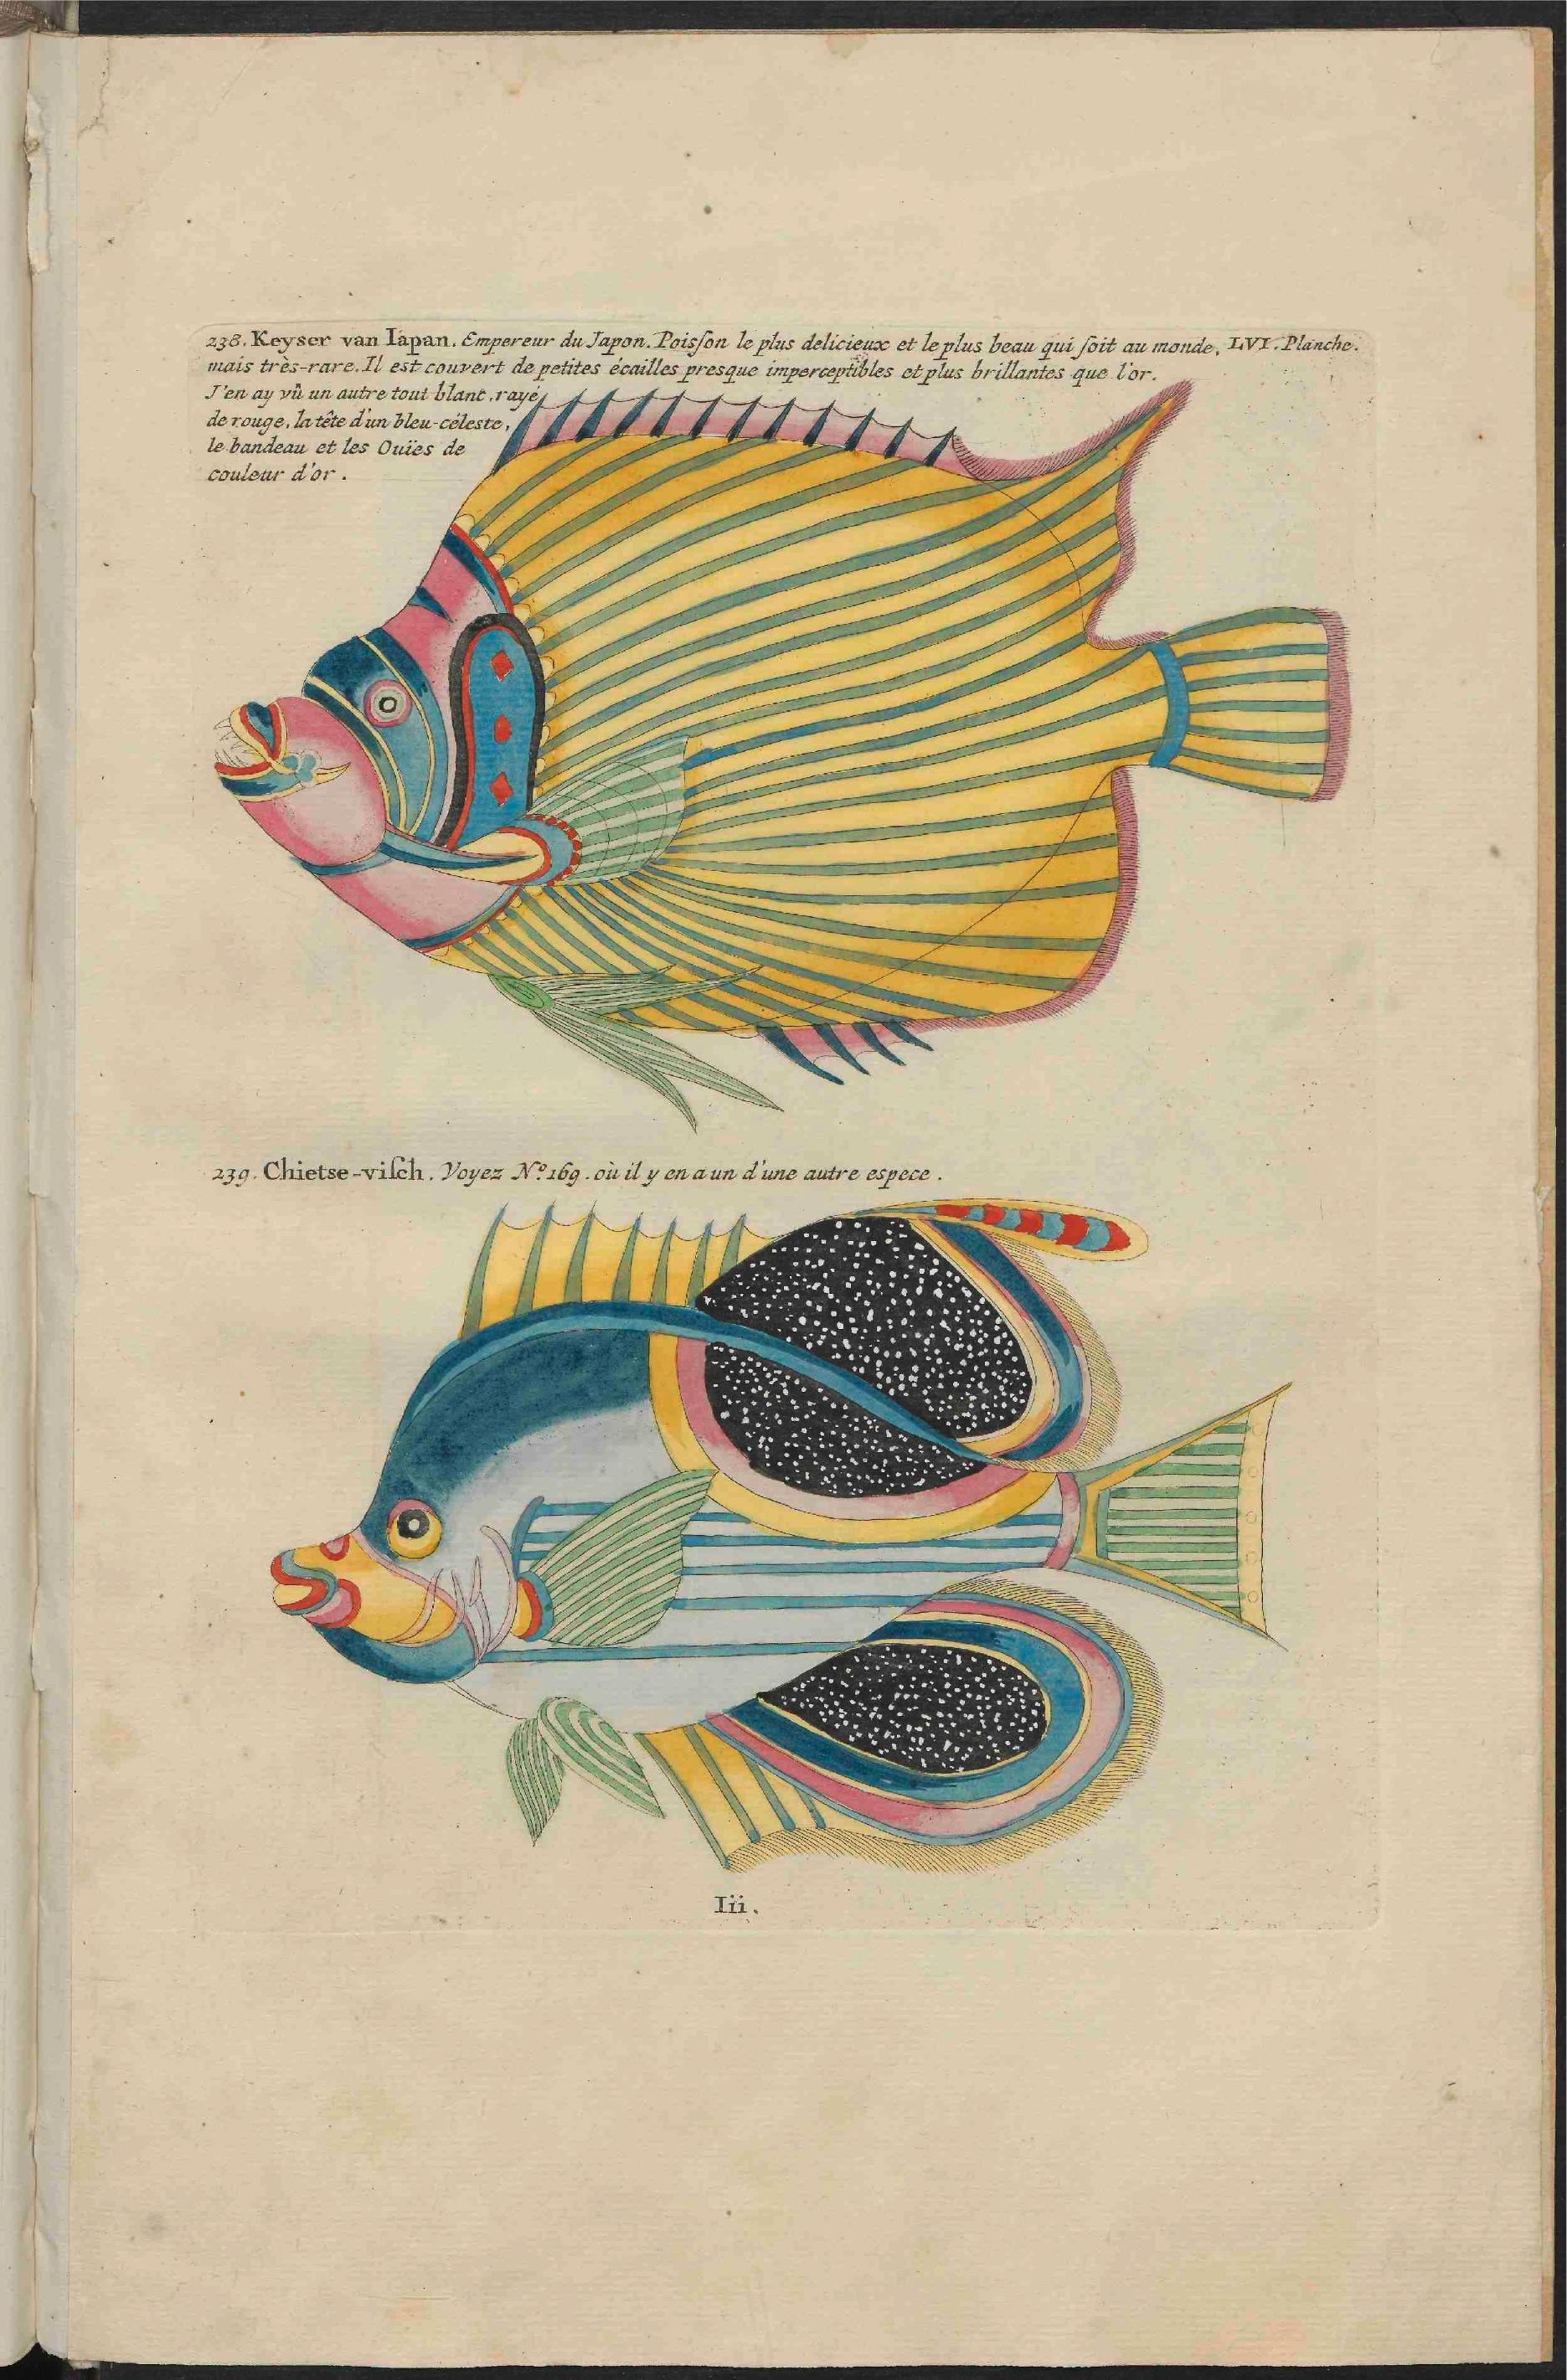 Fileub Utrecht Louis Renard 1782 Natuurlyke Historie